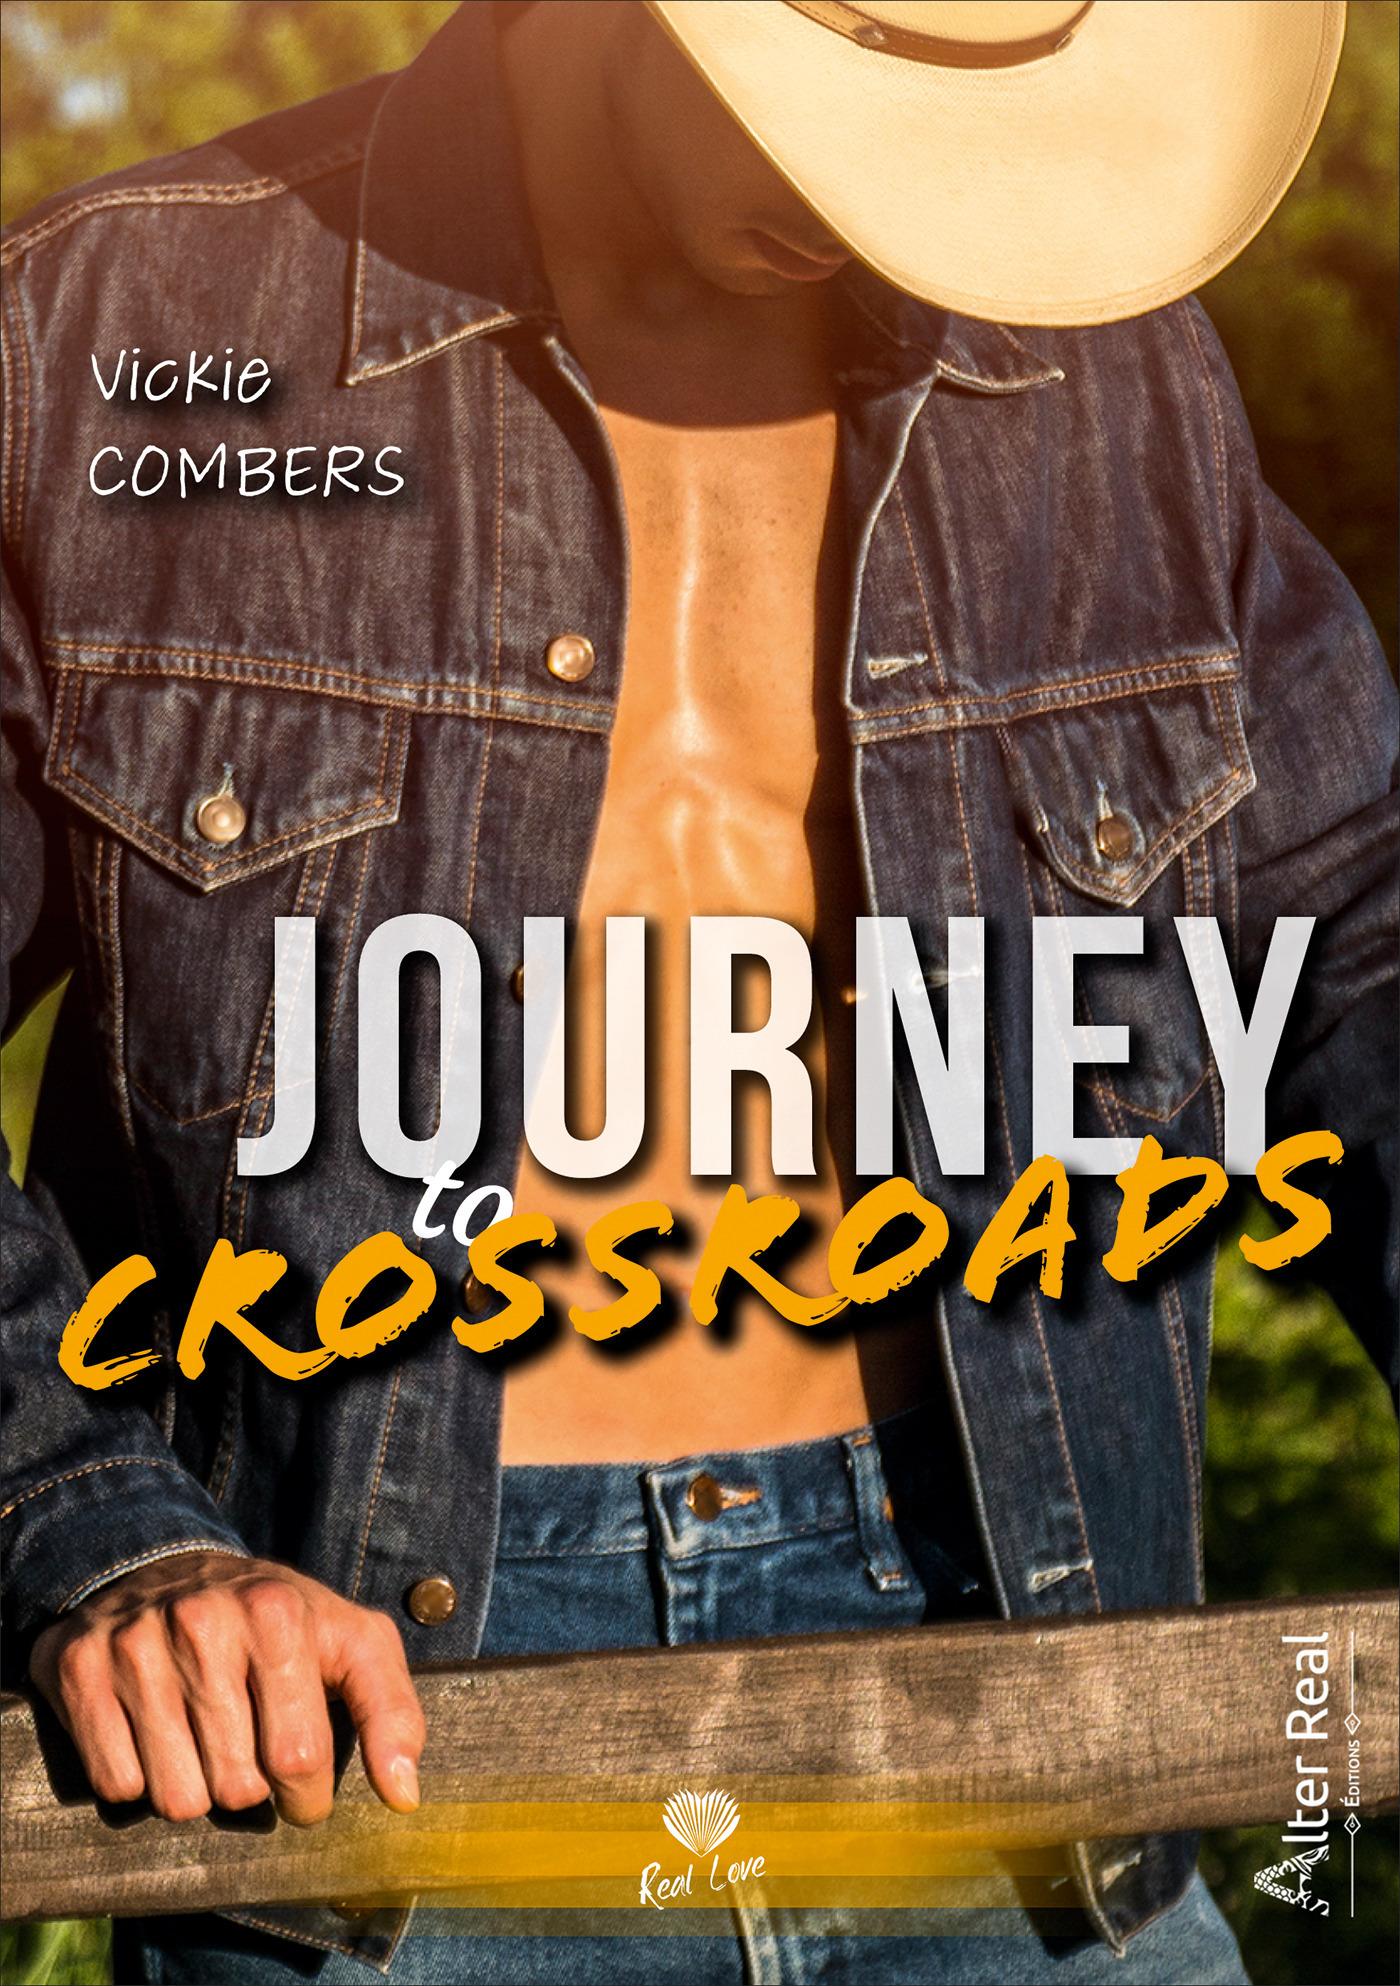 Journey to crossroads